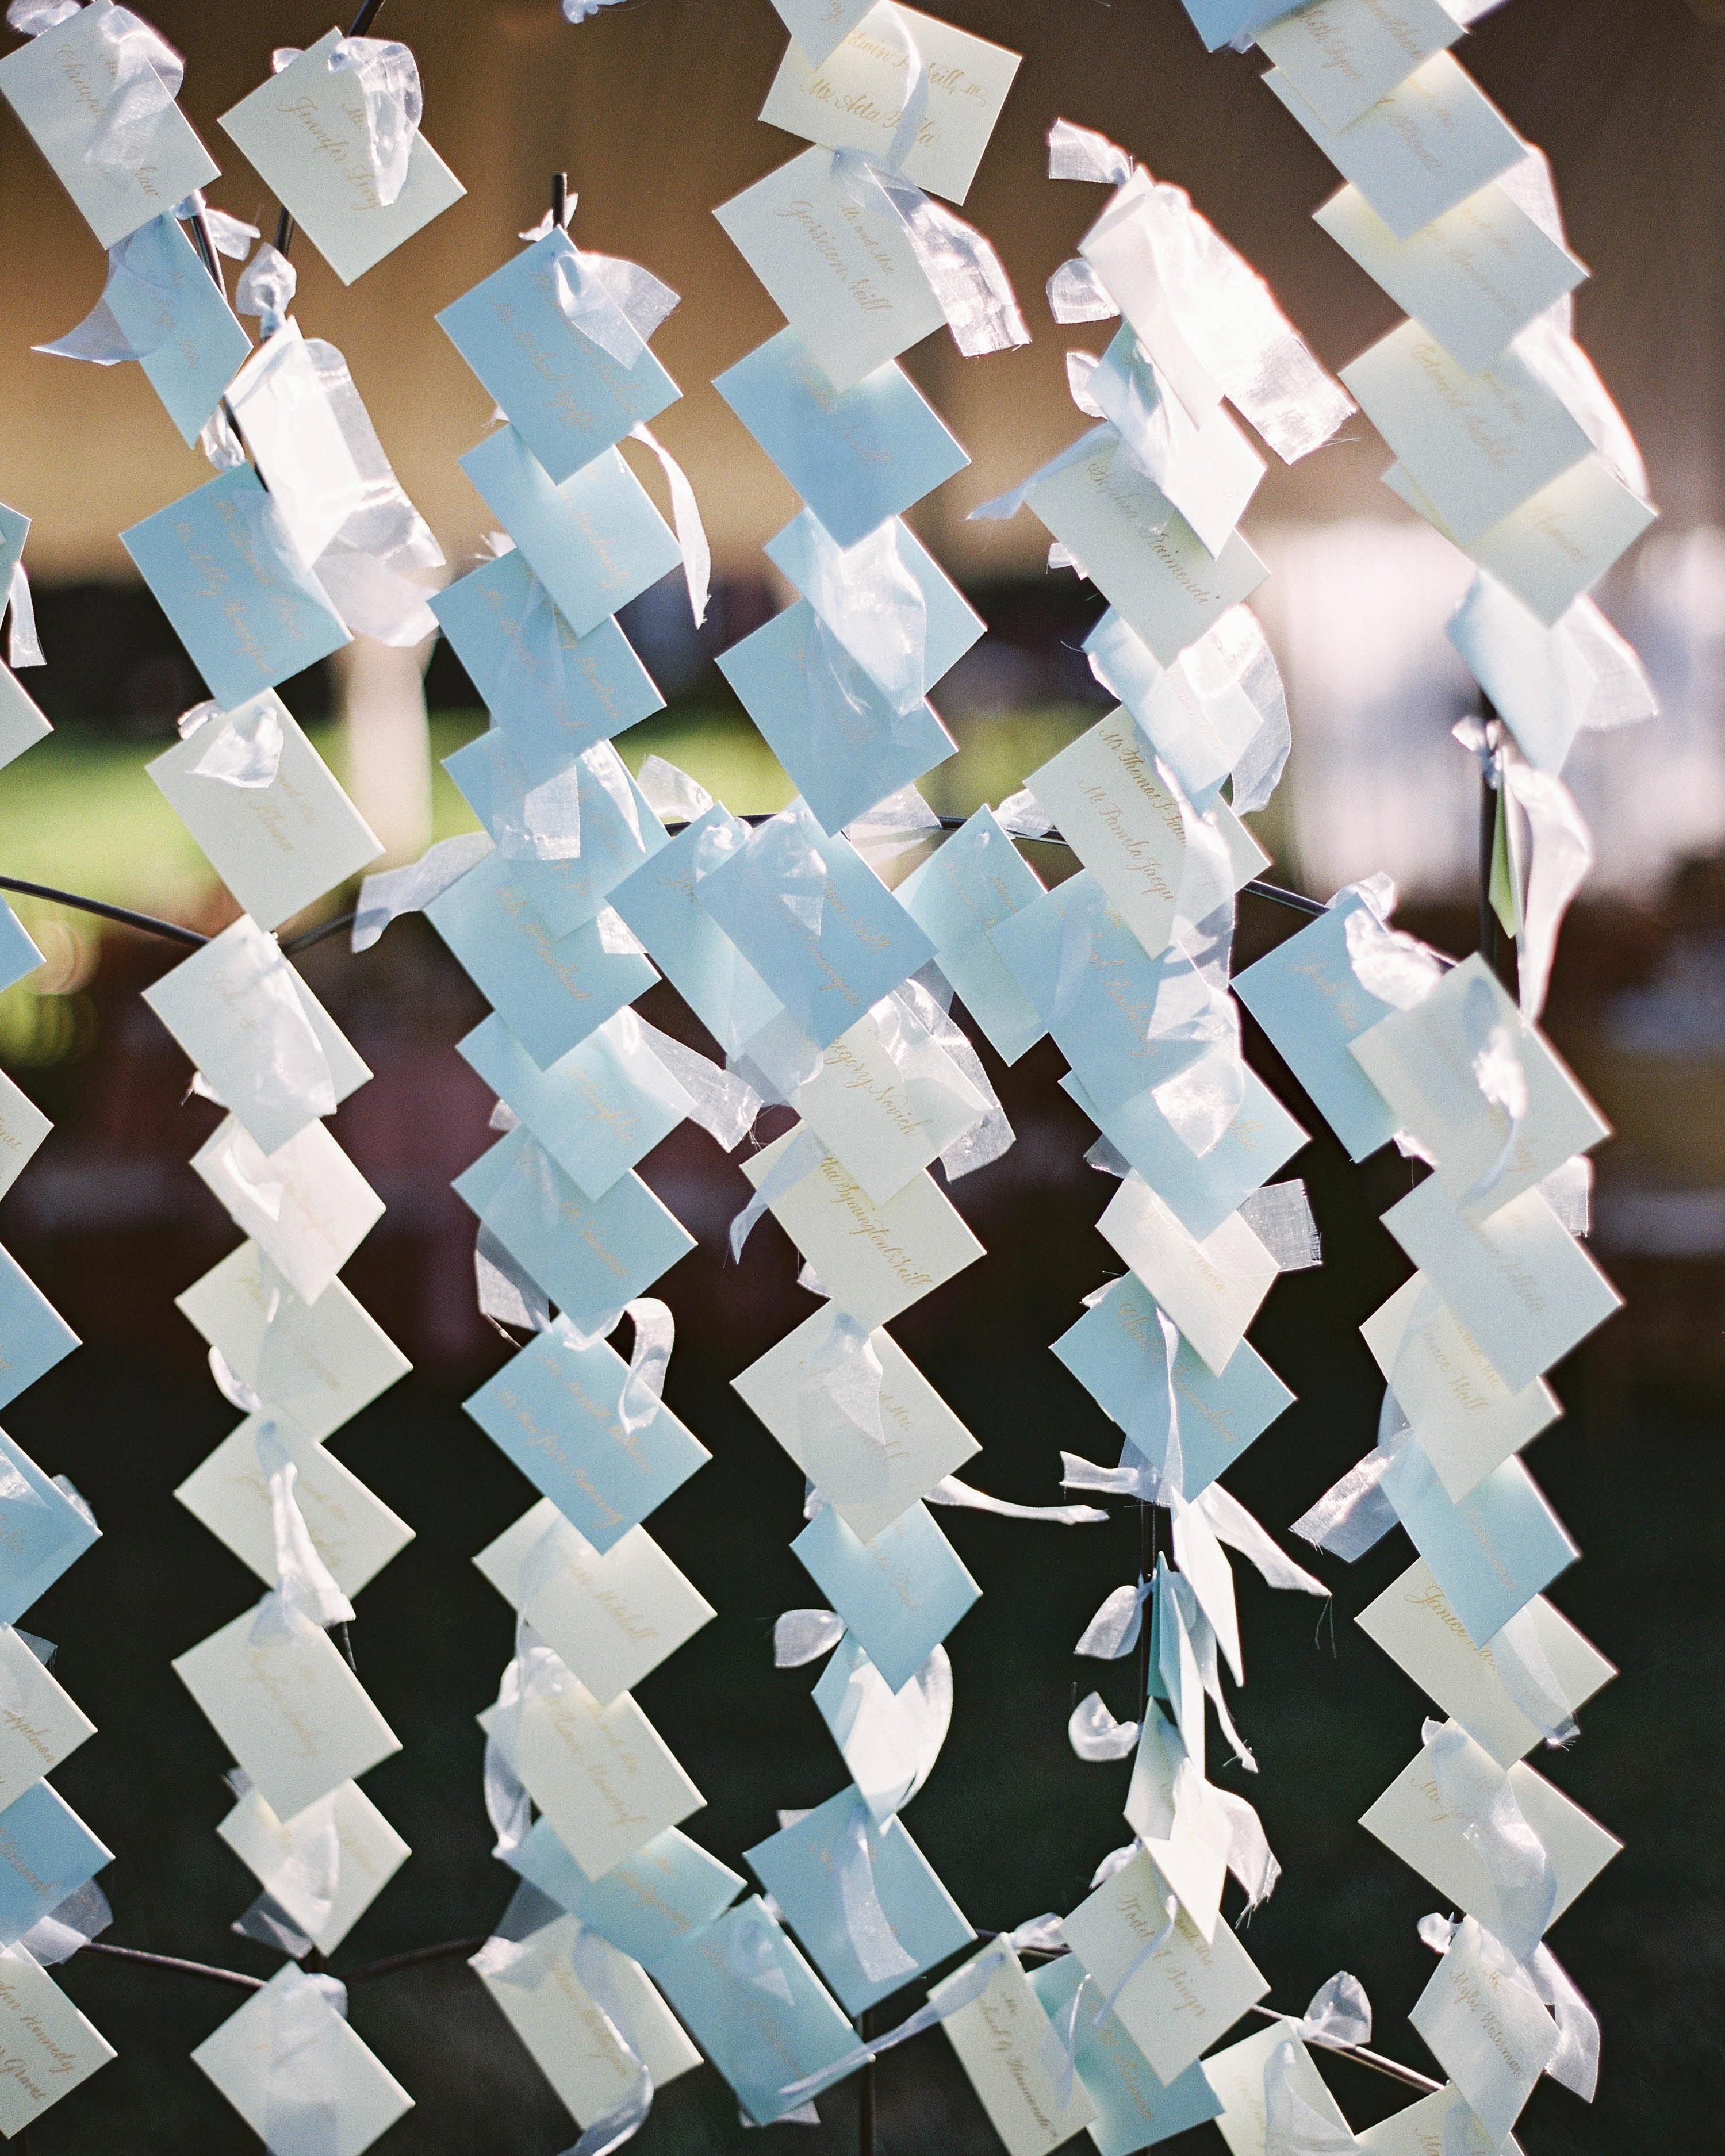 amy-garrison-wedding-escortcards-00731-6134266-0816.jpg